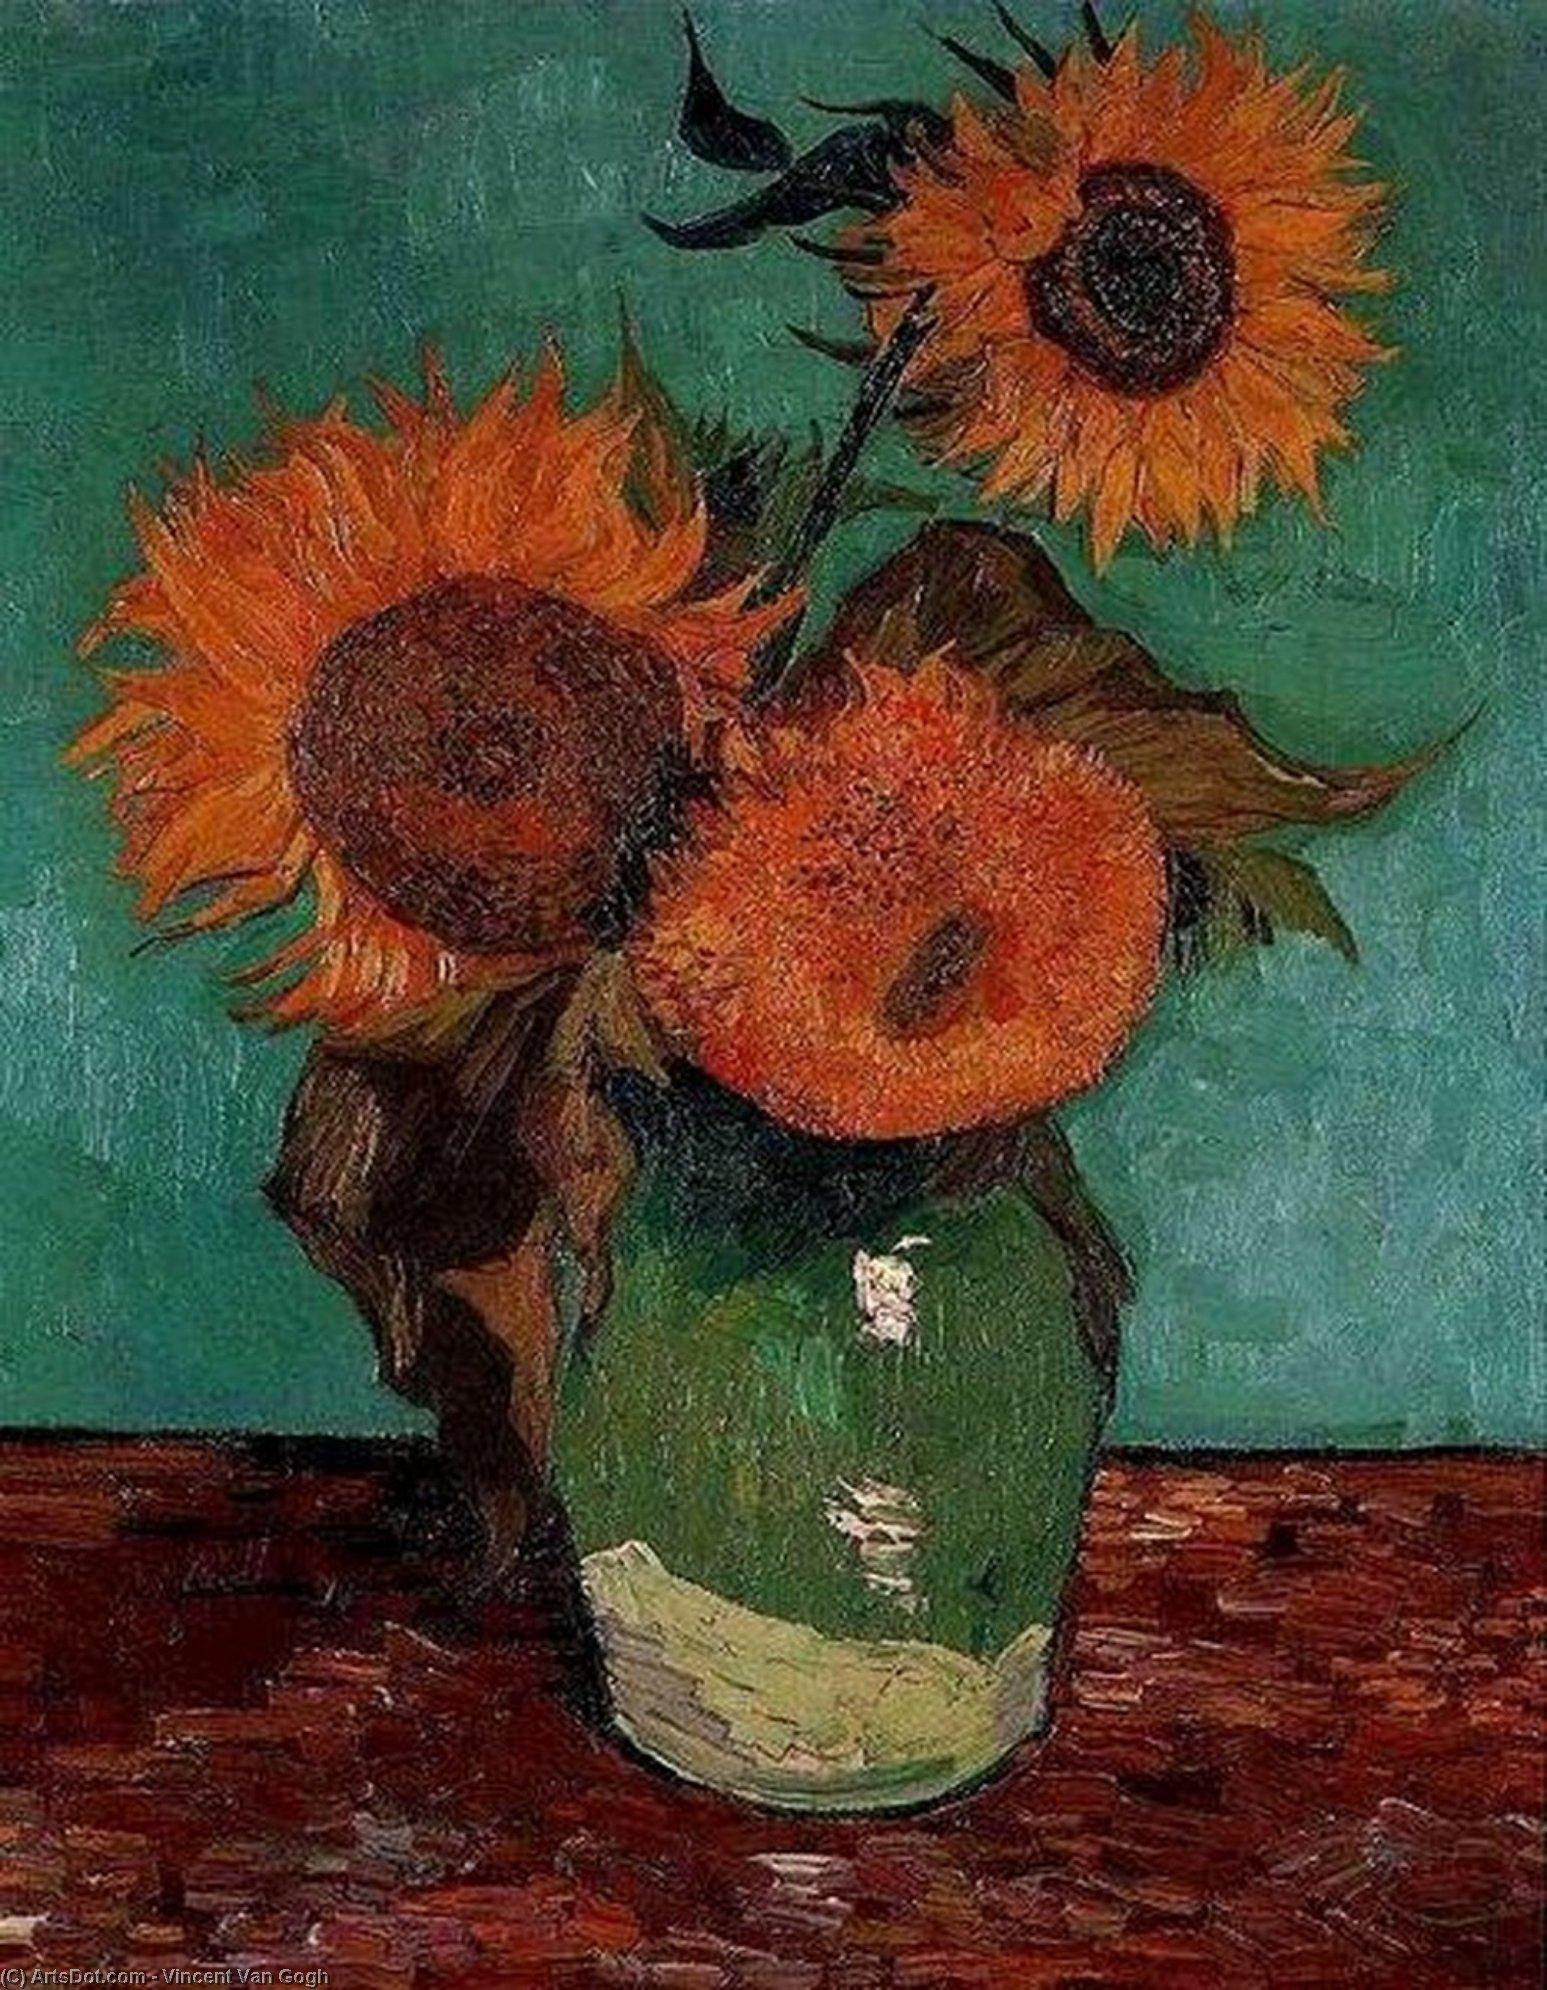 Sunflowers 1888 vincent van gogh wikiart sunflowers 1888 vincent van gogh reviewsmspy